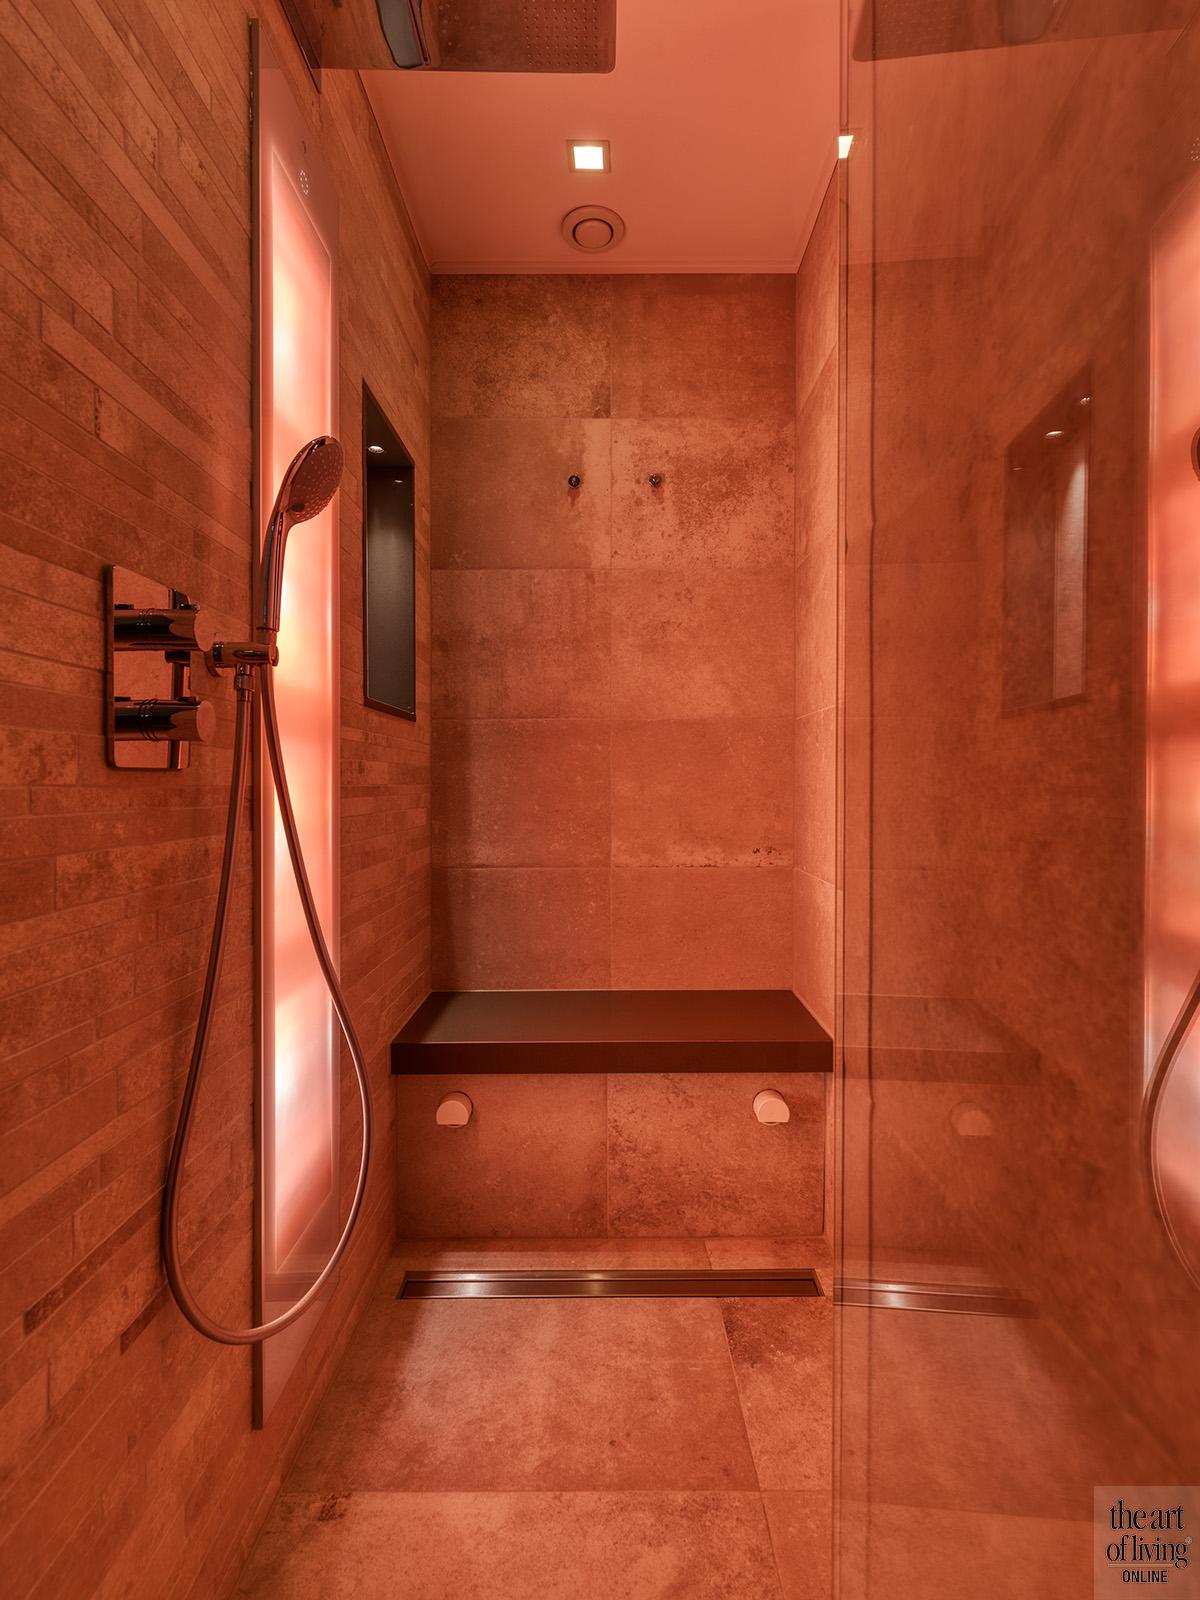 nieuwbouwvilla, wns architecten, the art of living